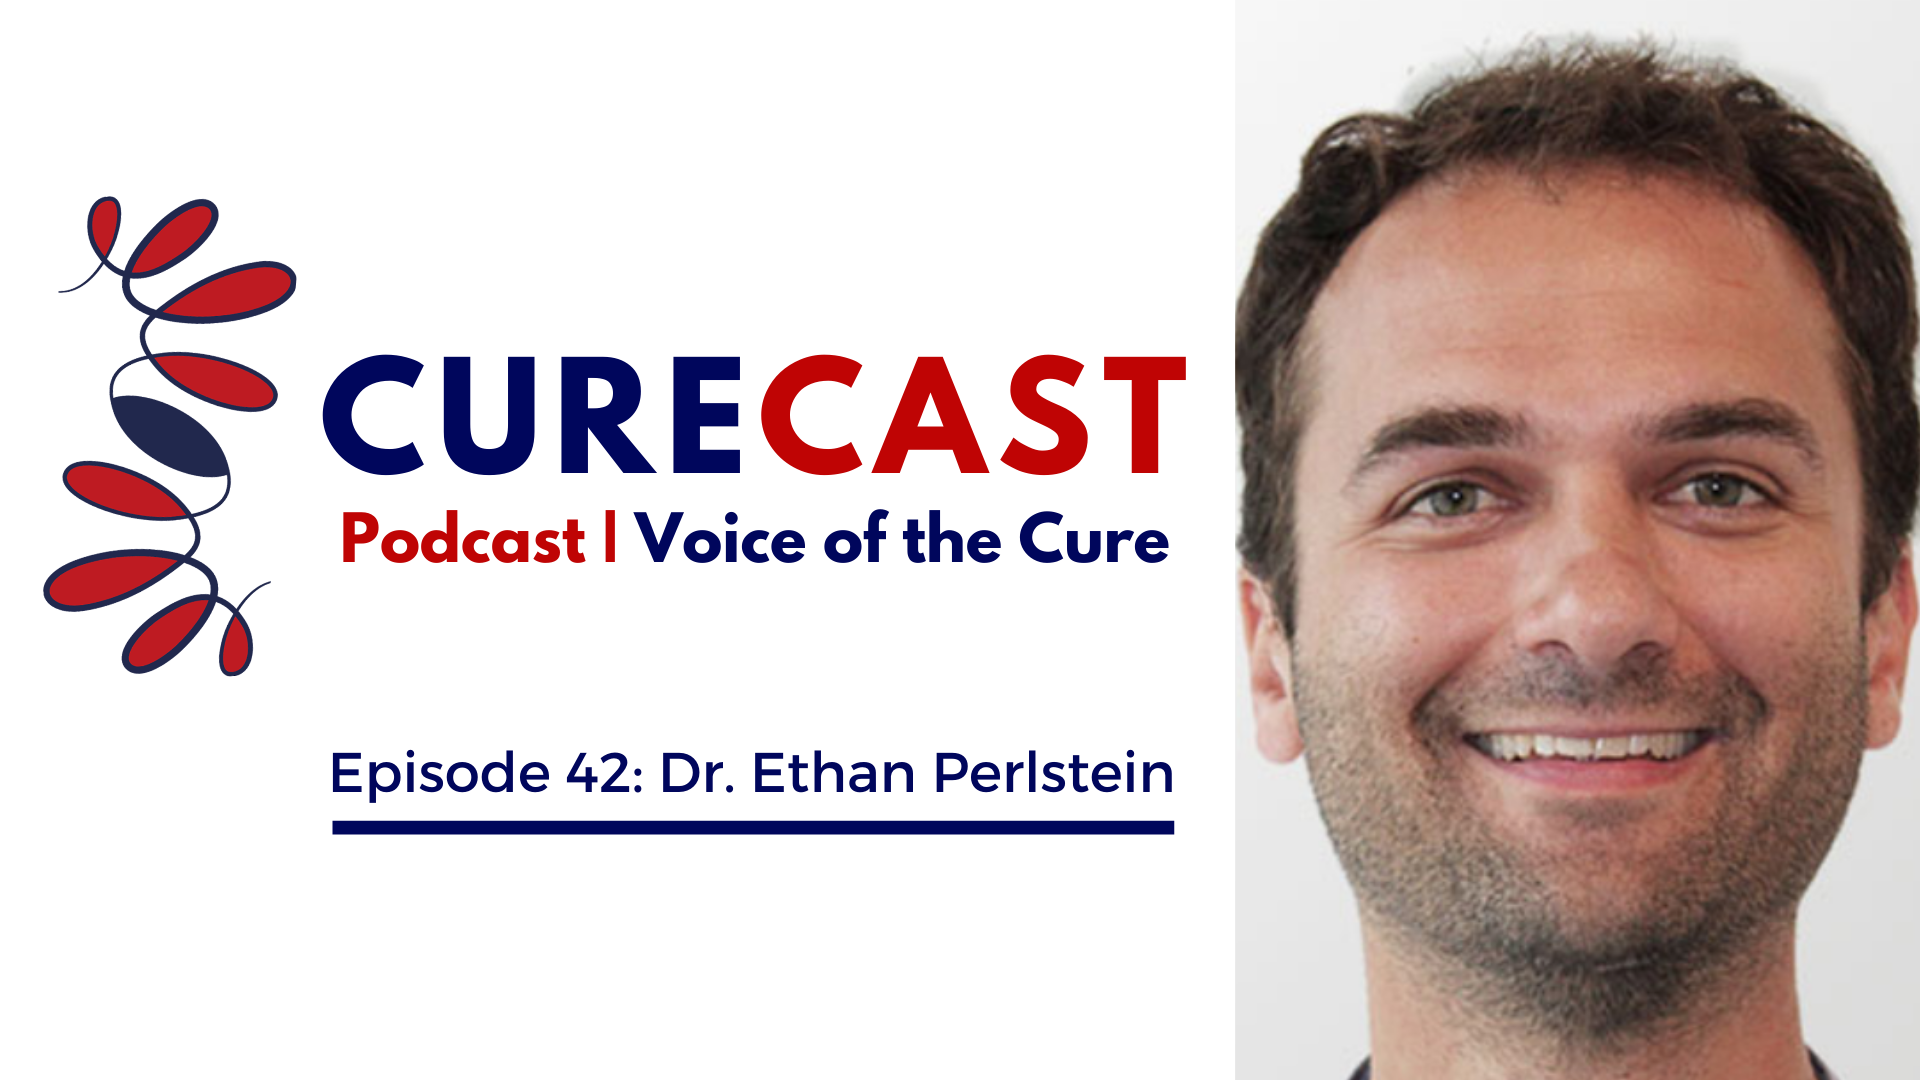 CureCast Episode 42: Dr. Ethan Perlstein